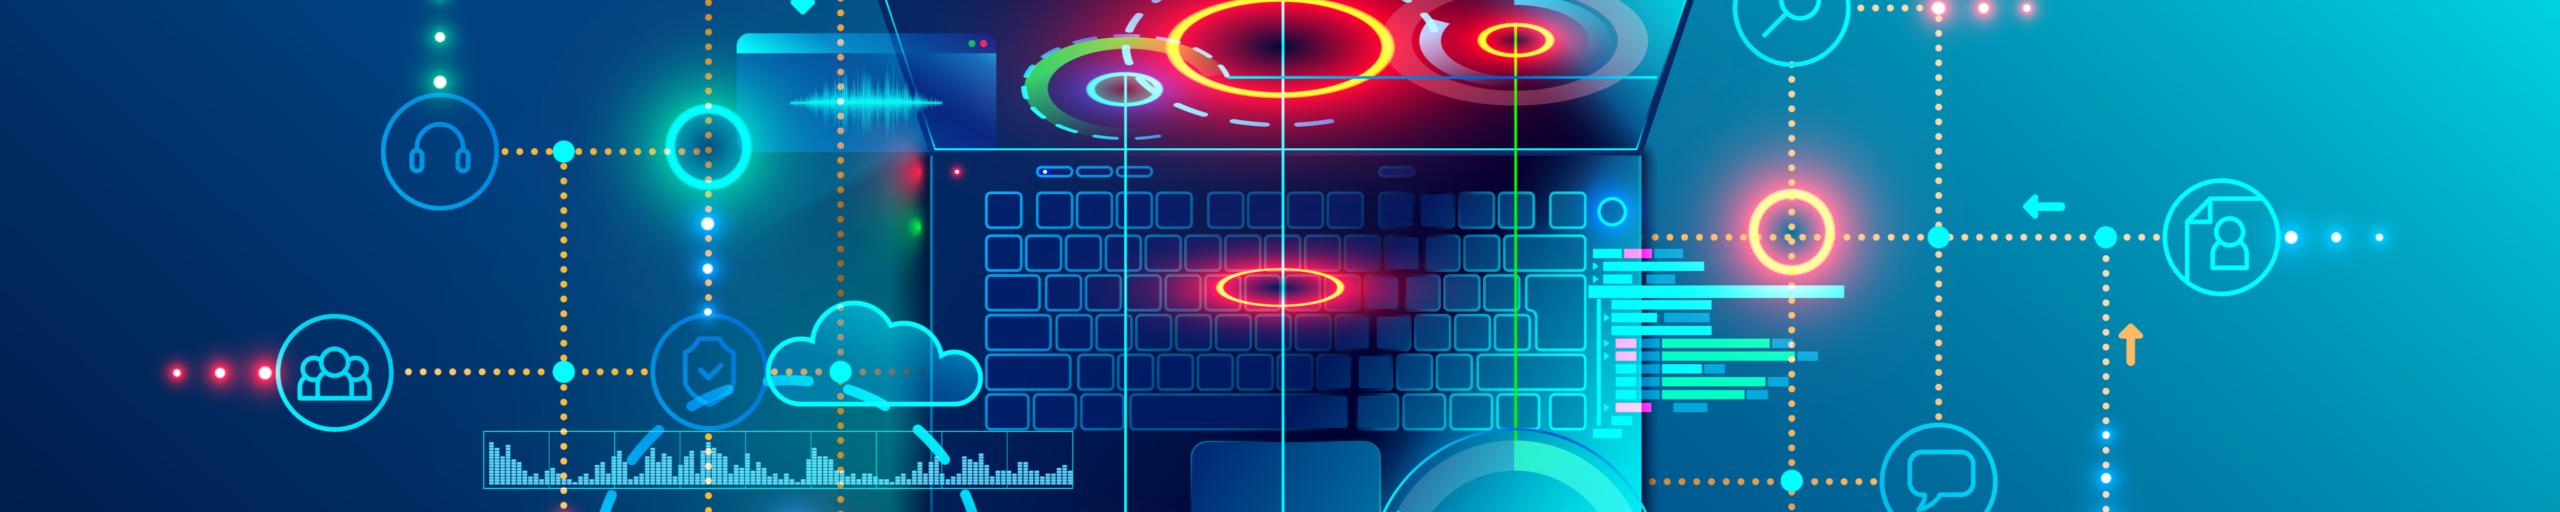 Headerbild Digital Laptop Bunt